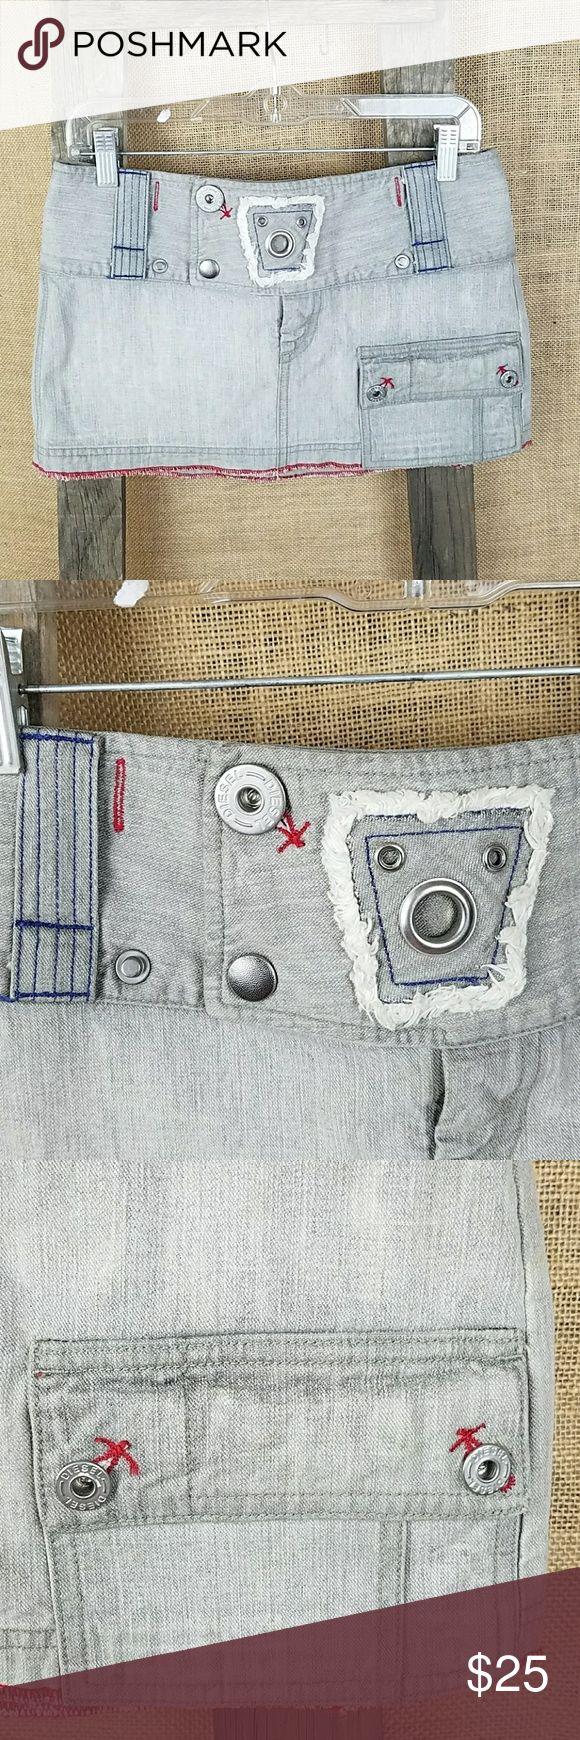 "Diesel women's 27 jeans denim mini skirt gray c Diesel women's 27 jeans denim mini skirt gray contrast stitching, 100% cotton.  Waist side to side: 15.5"" Length: 11"" Diesel Skirts Mini"